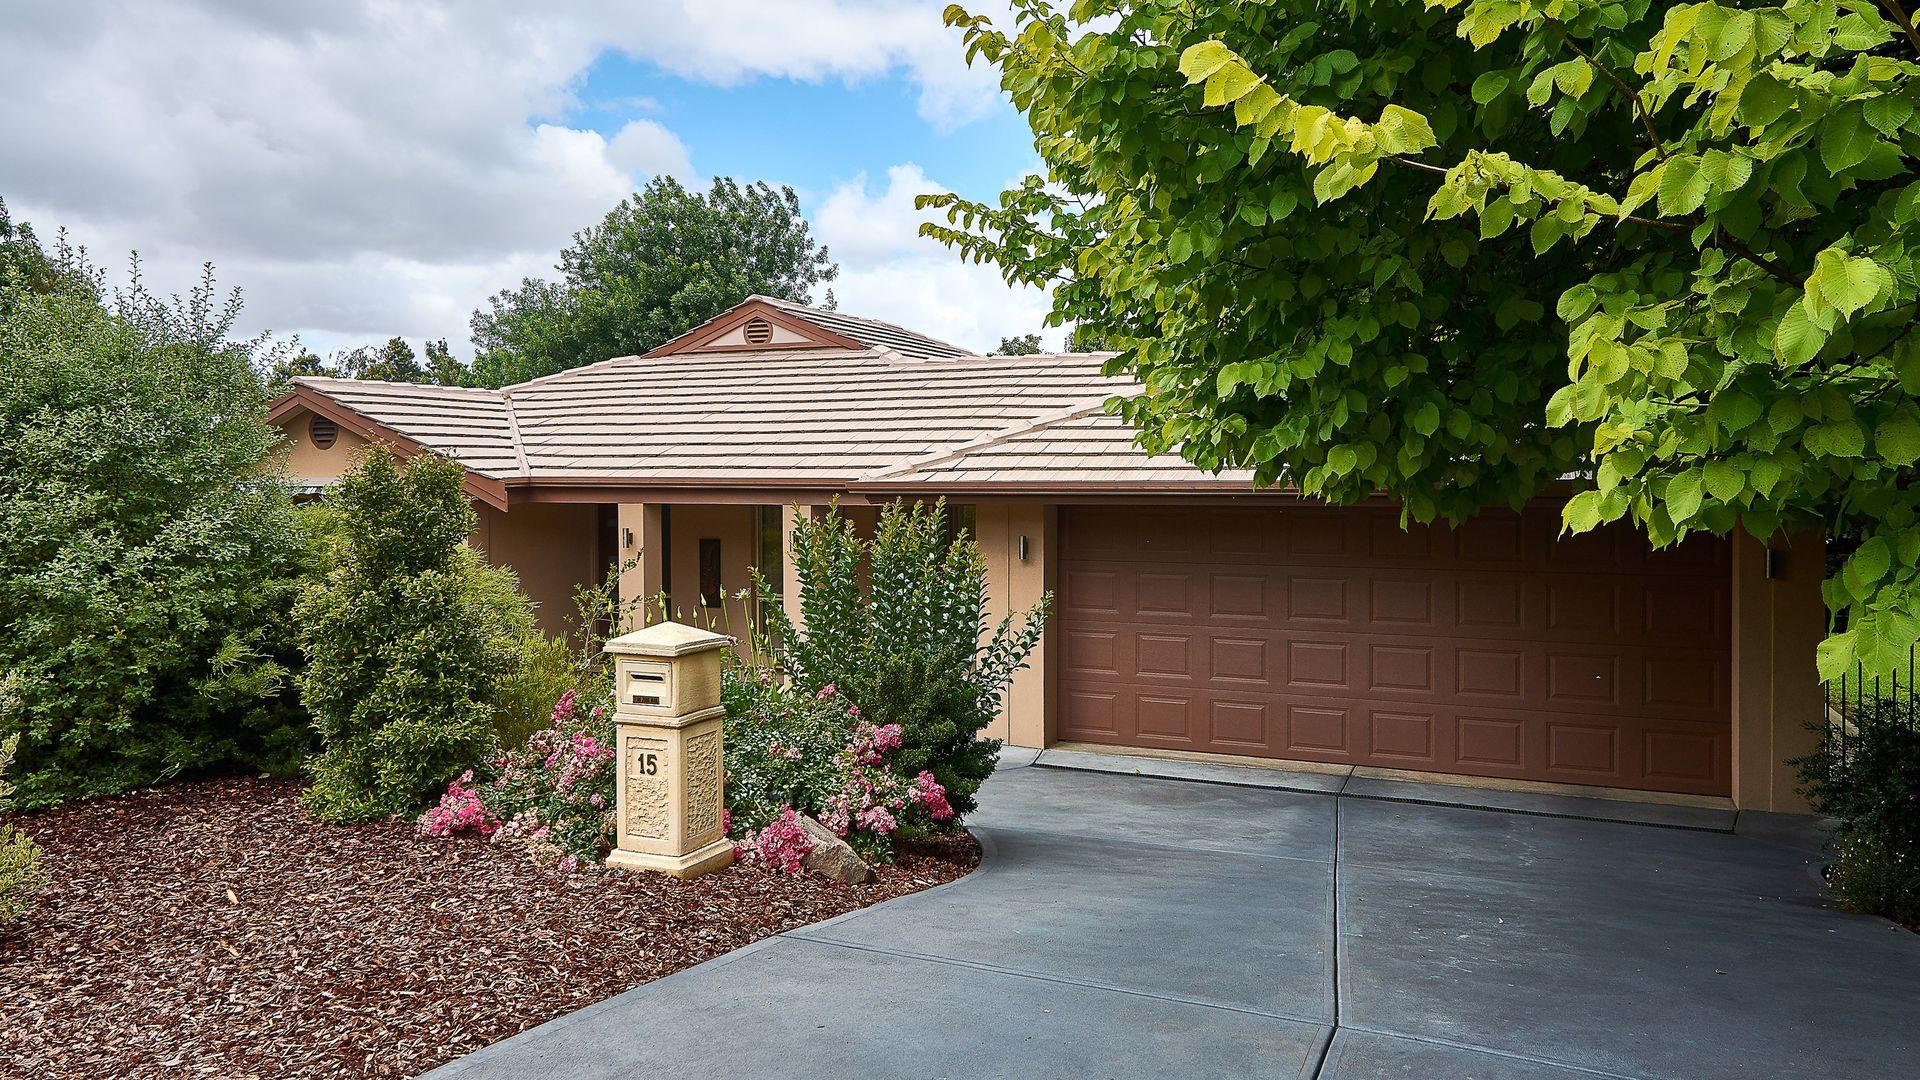 15 Wilkinson Court, Mount Barker SA 5251, Image 1